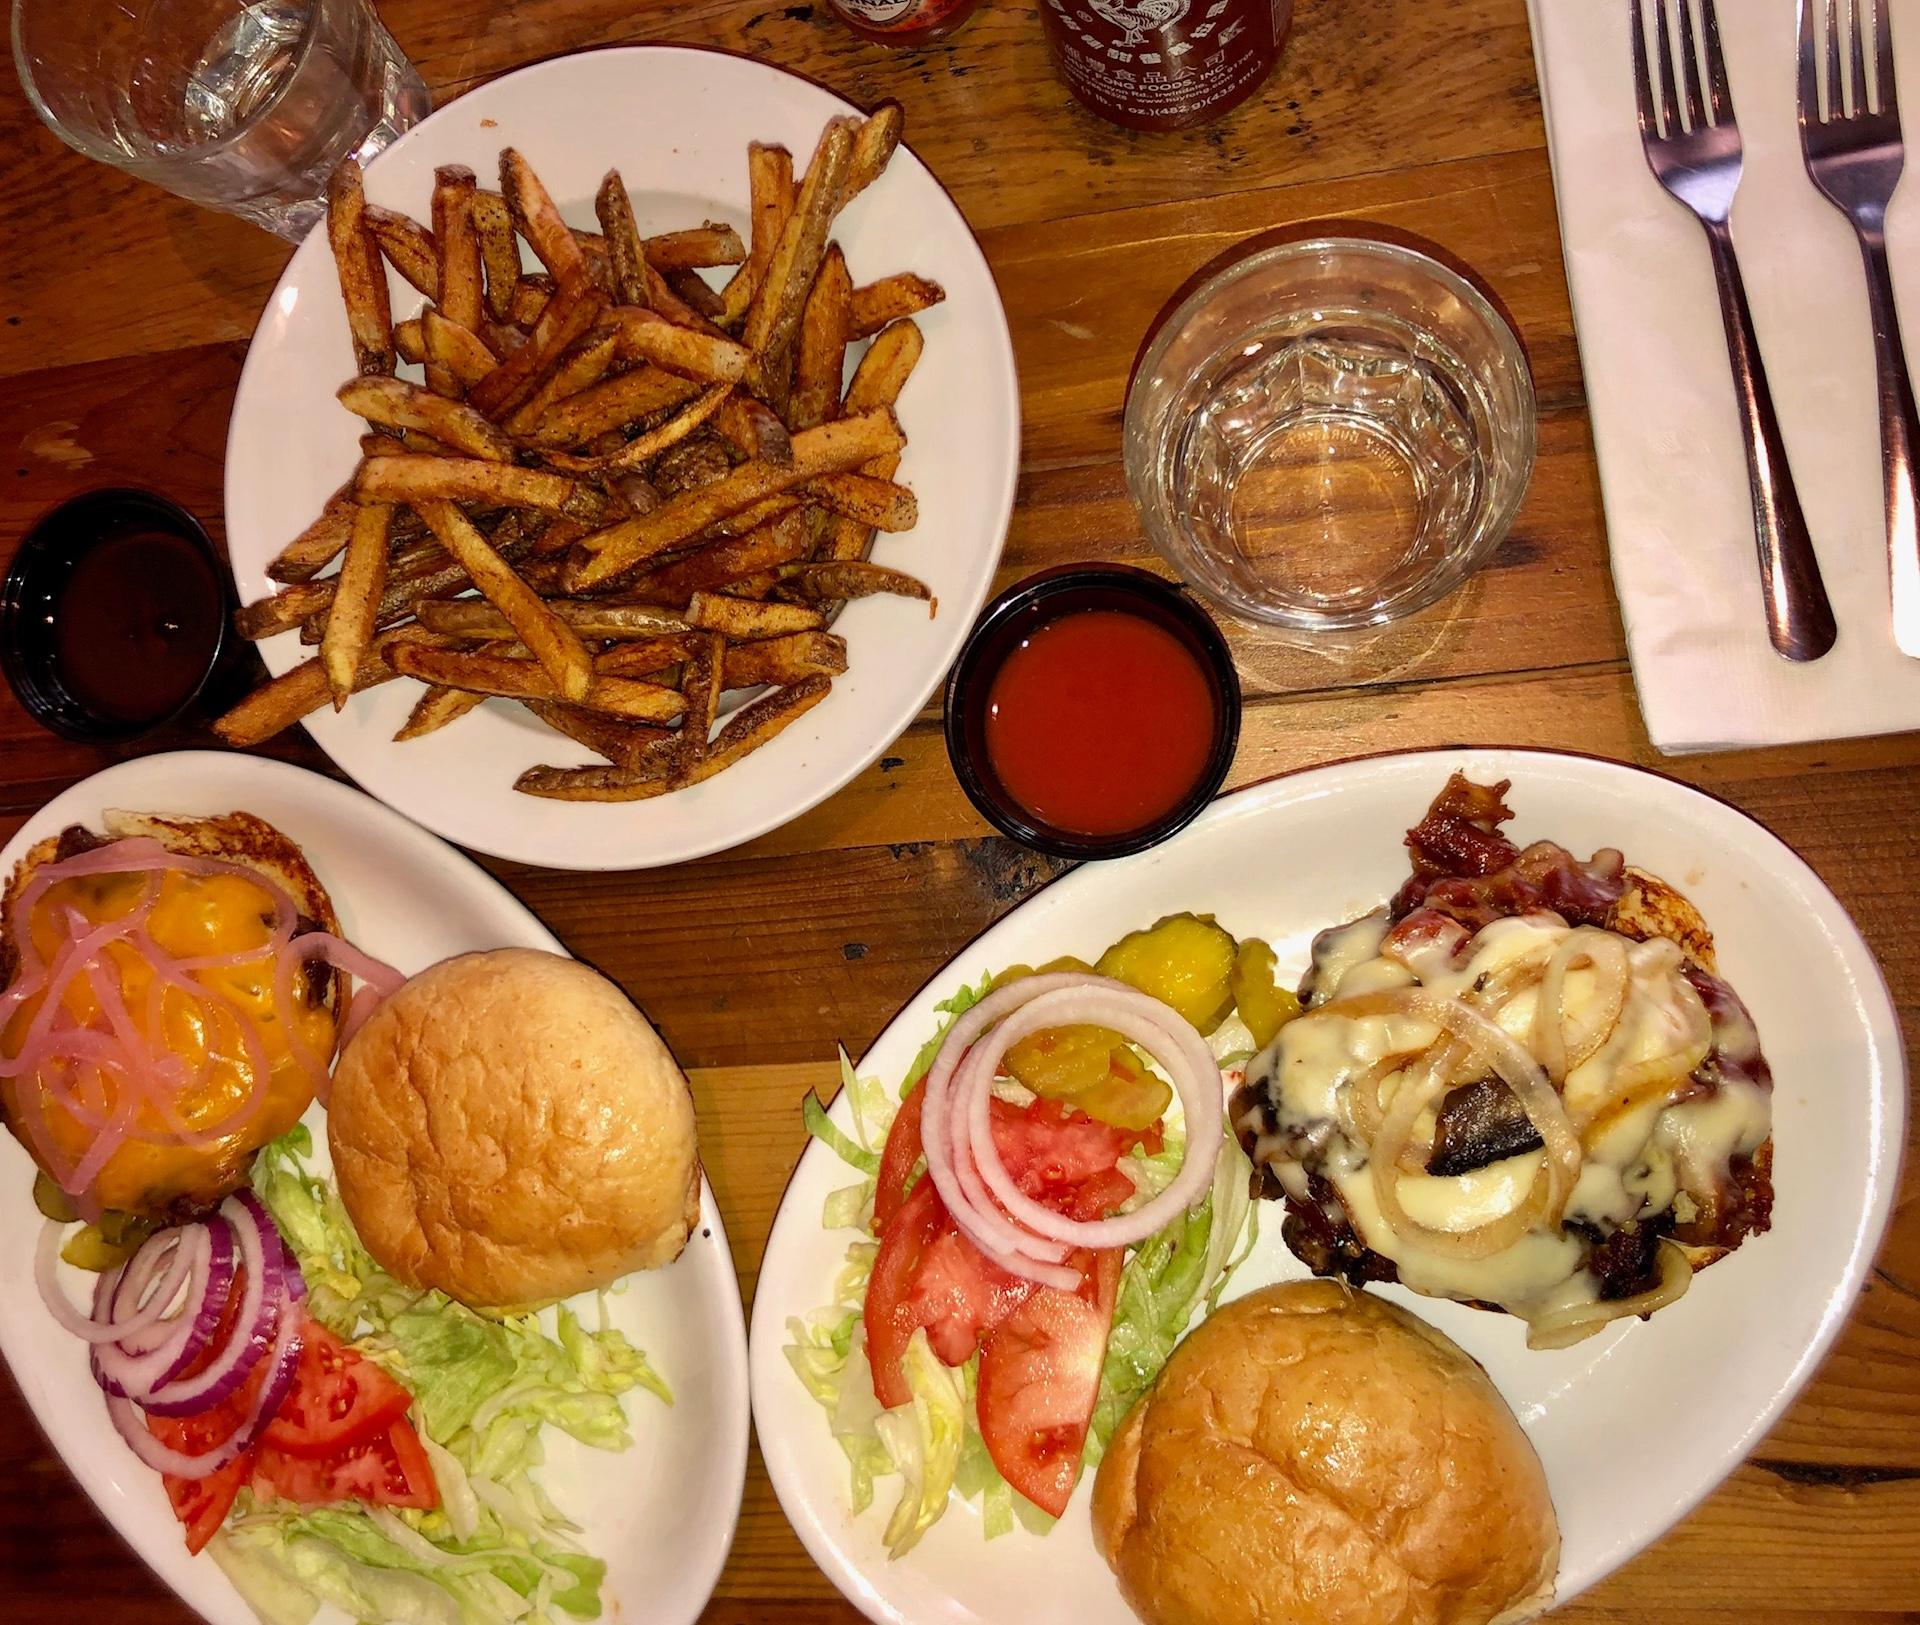 Build it Burger (left), Mushroom Swiss Burger (right), and fries (top)